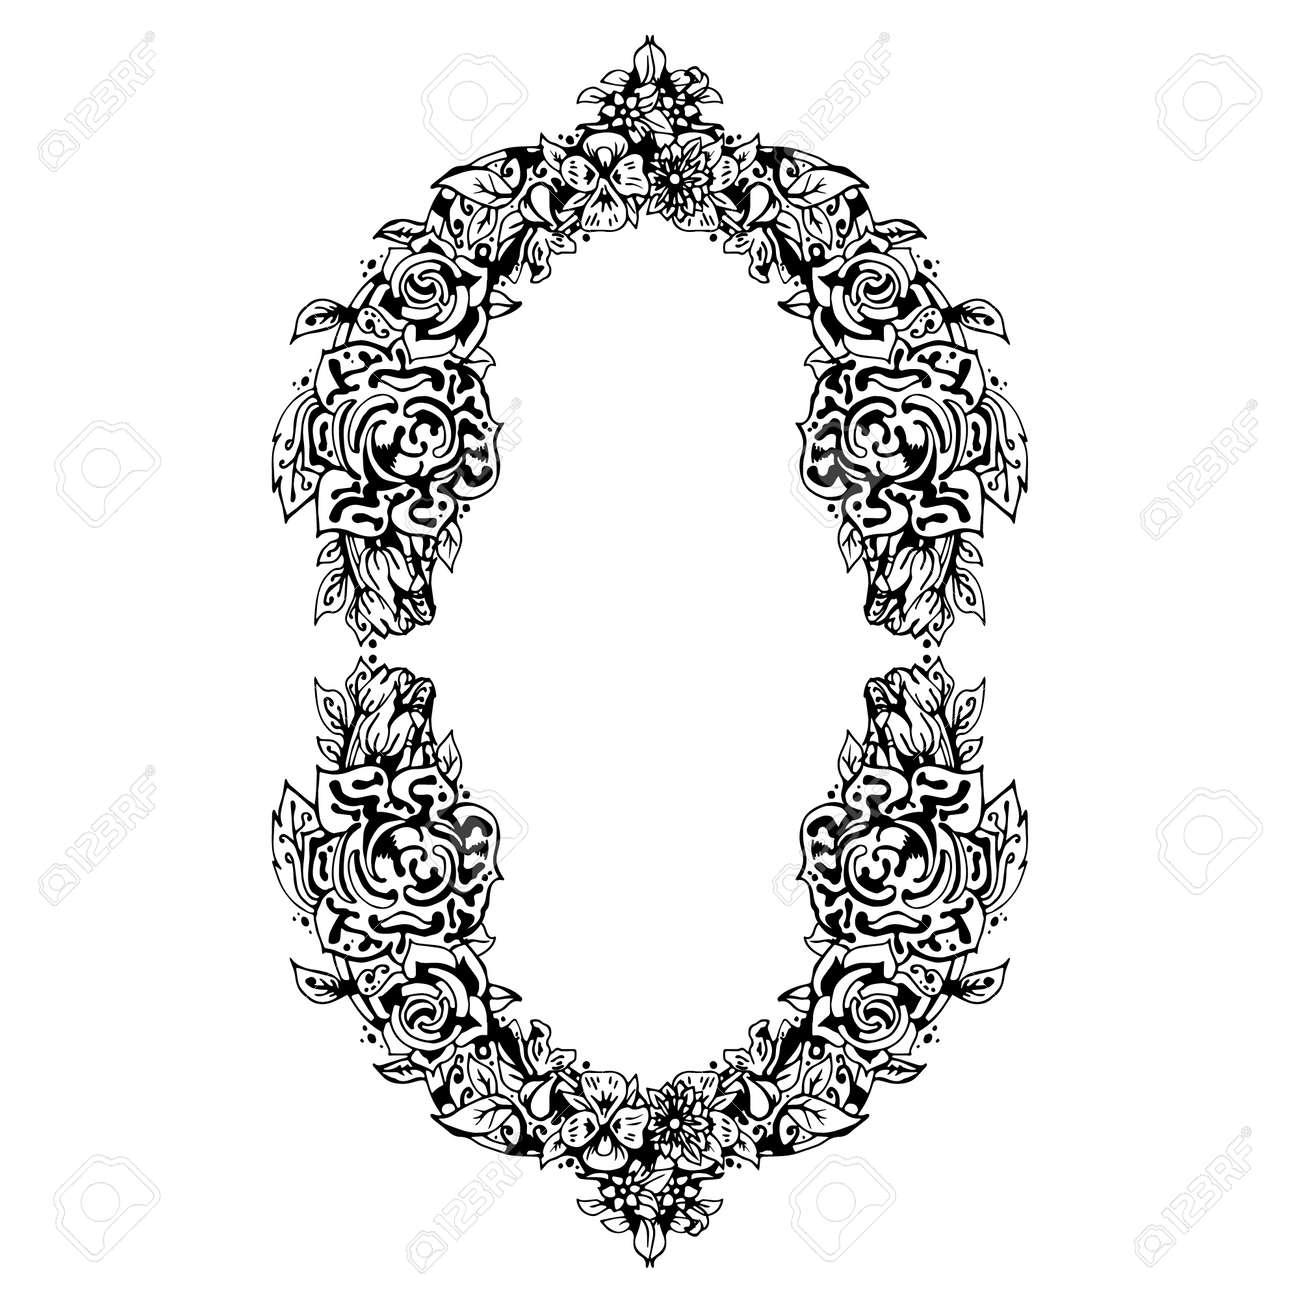 Asombroso 5x7 Negro Marco De Imagen Ovalada Embellecimiento - Ideas ...